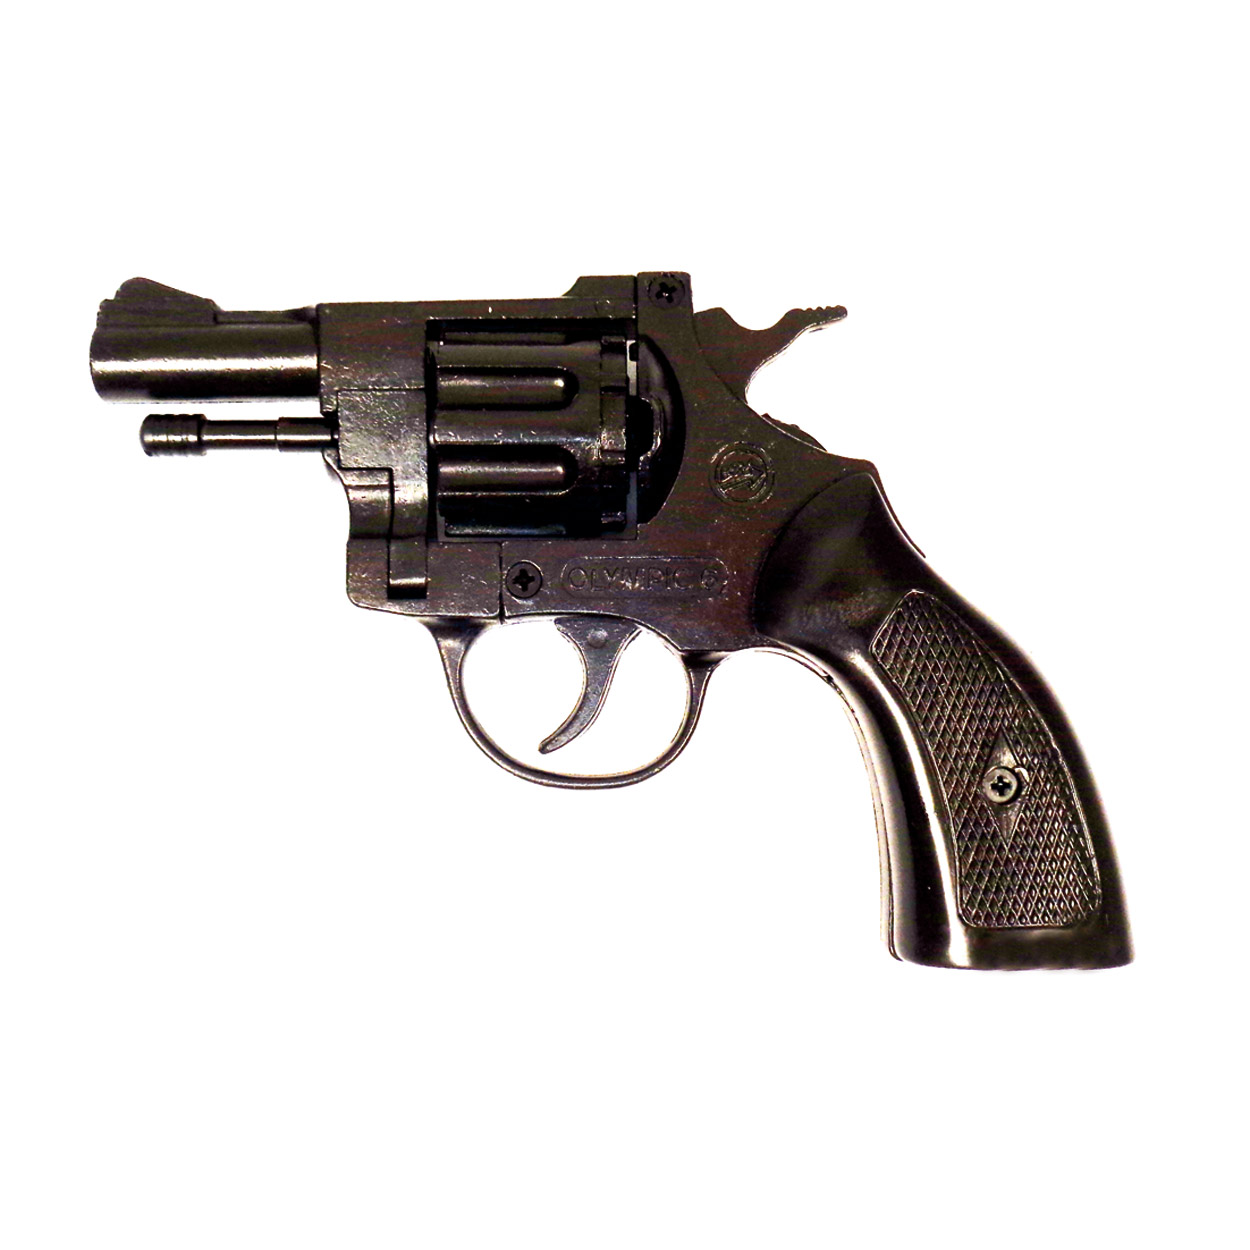 Pistola Revolver a Salve con Plastic Grip Olimpyc  Calibro 6 - 22